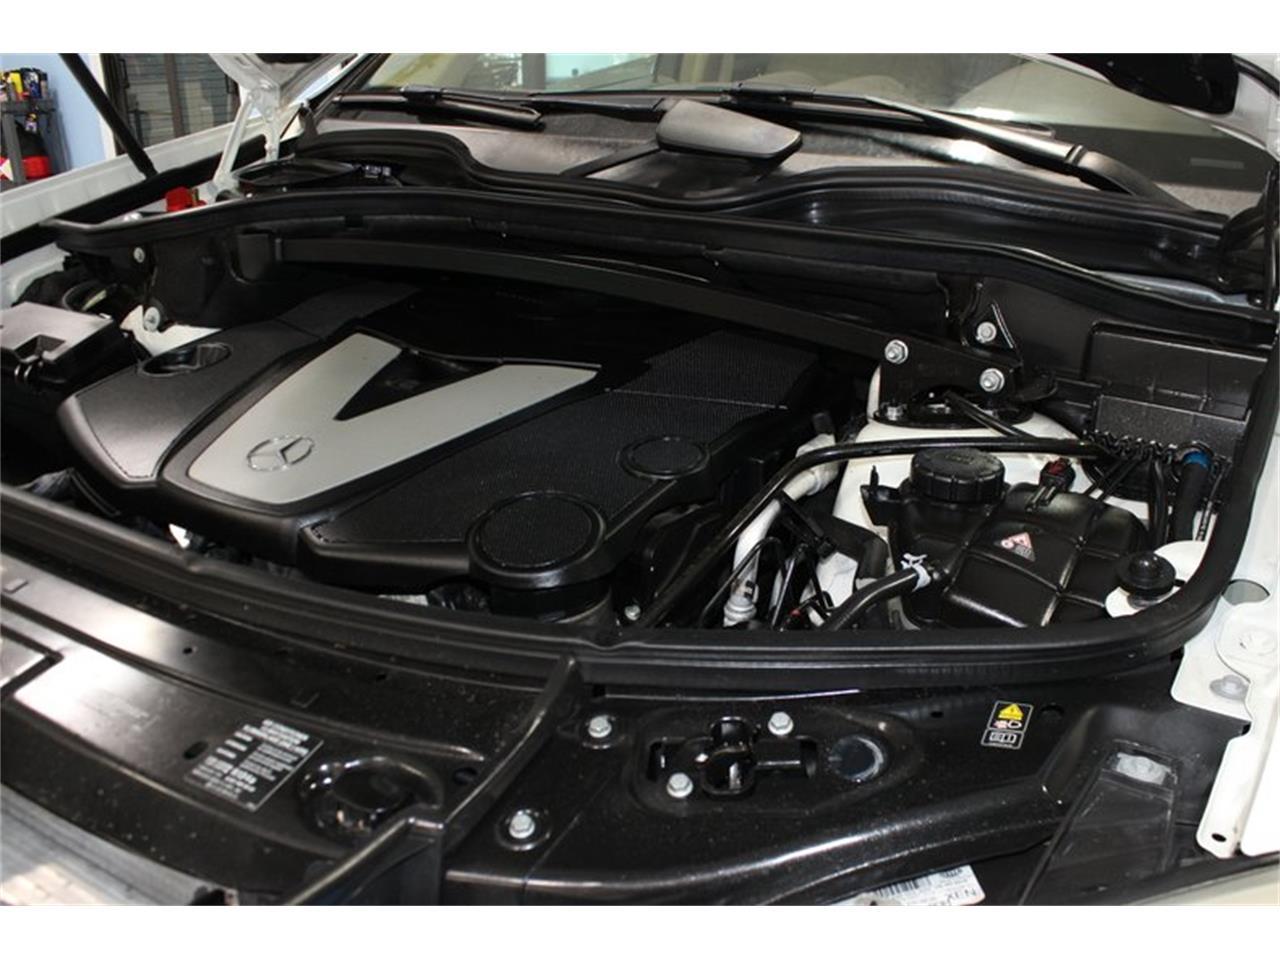 For Sale: 2012 Mercedes-Benz GL450 in Palmetto, Florida